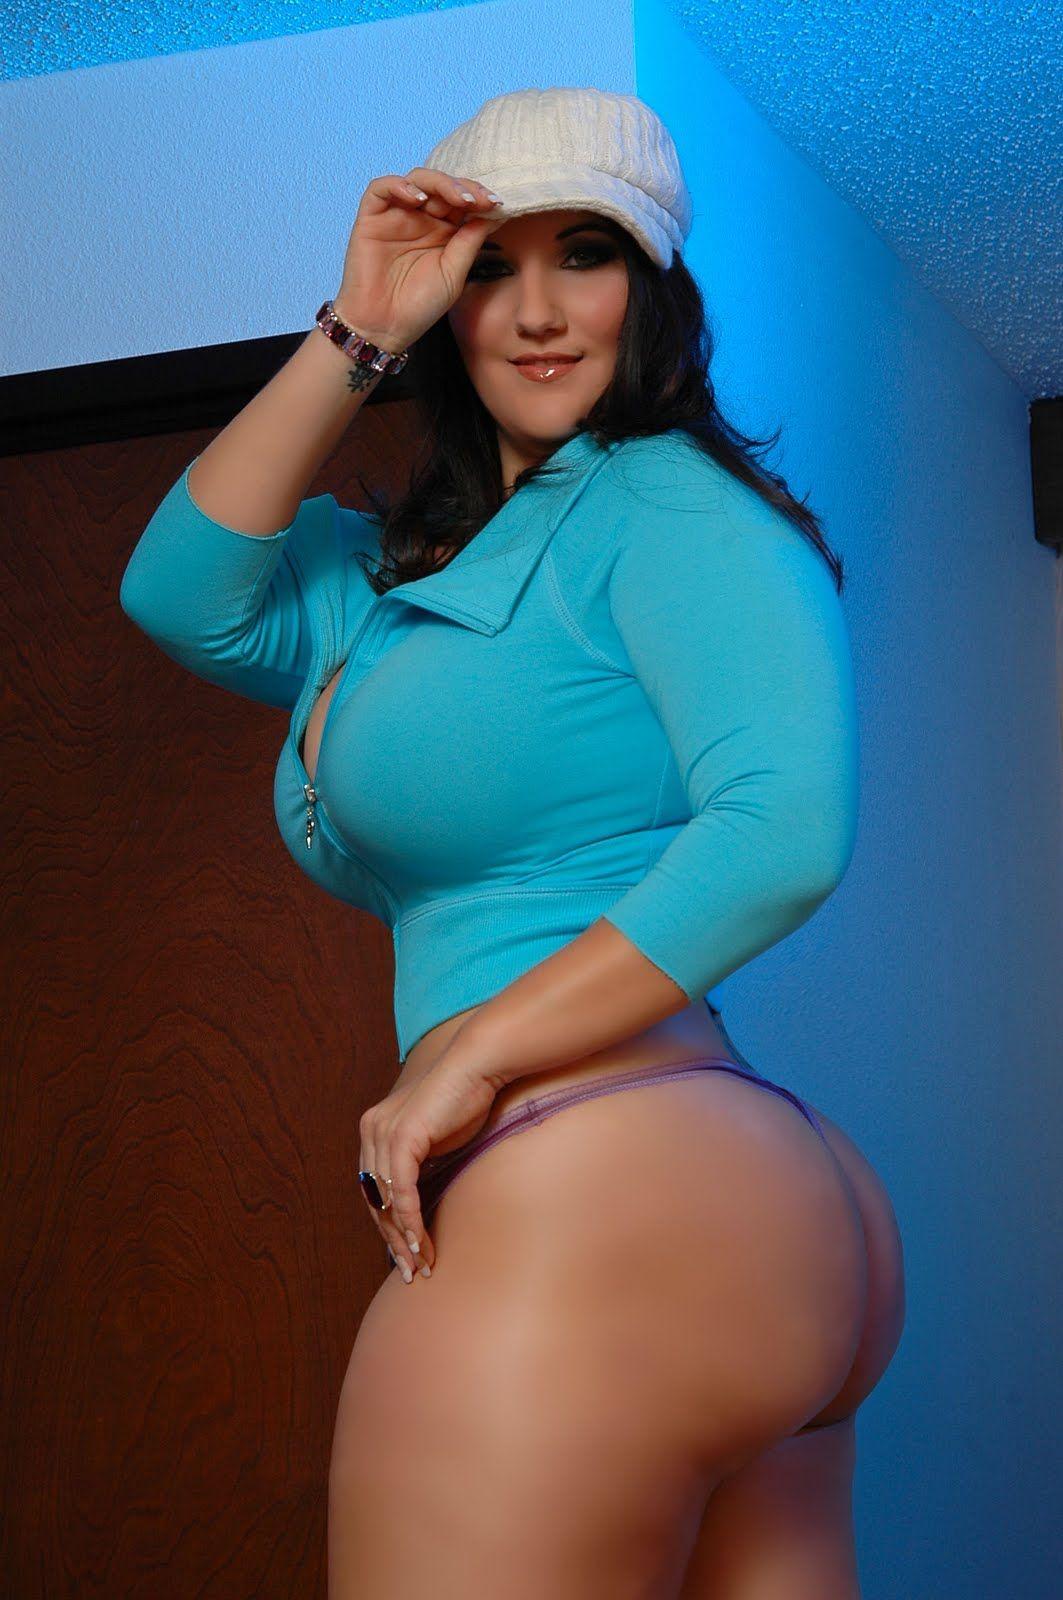 Paige Monroe Sexy Curves, Nice Curves, Curvy Women, Zaftig, Voluptuous  Women,